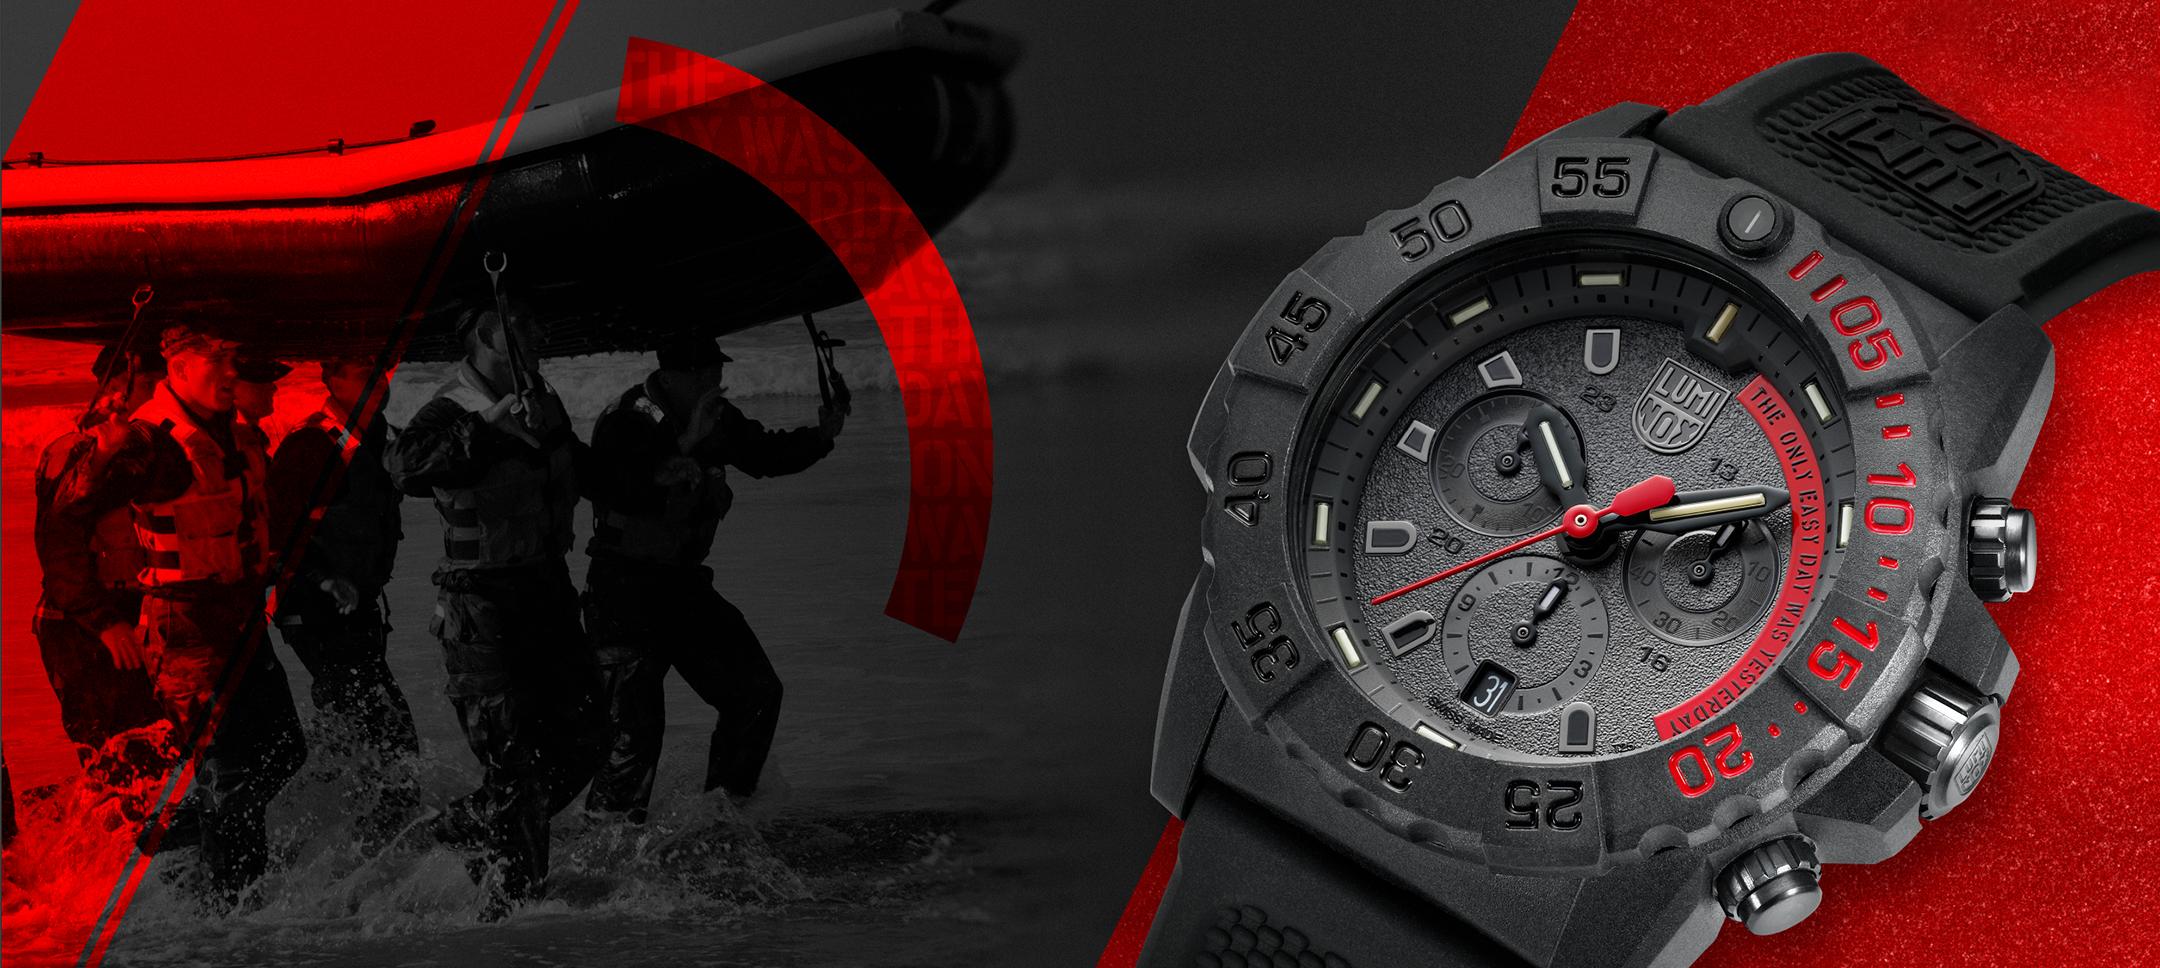 Navy SEAL Chronograph - 3580 series